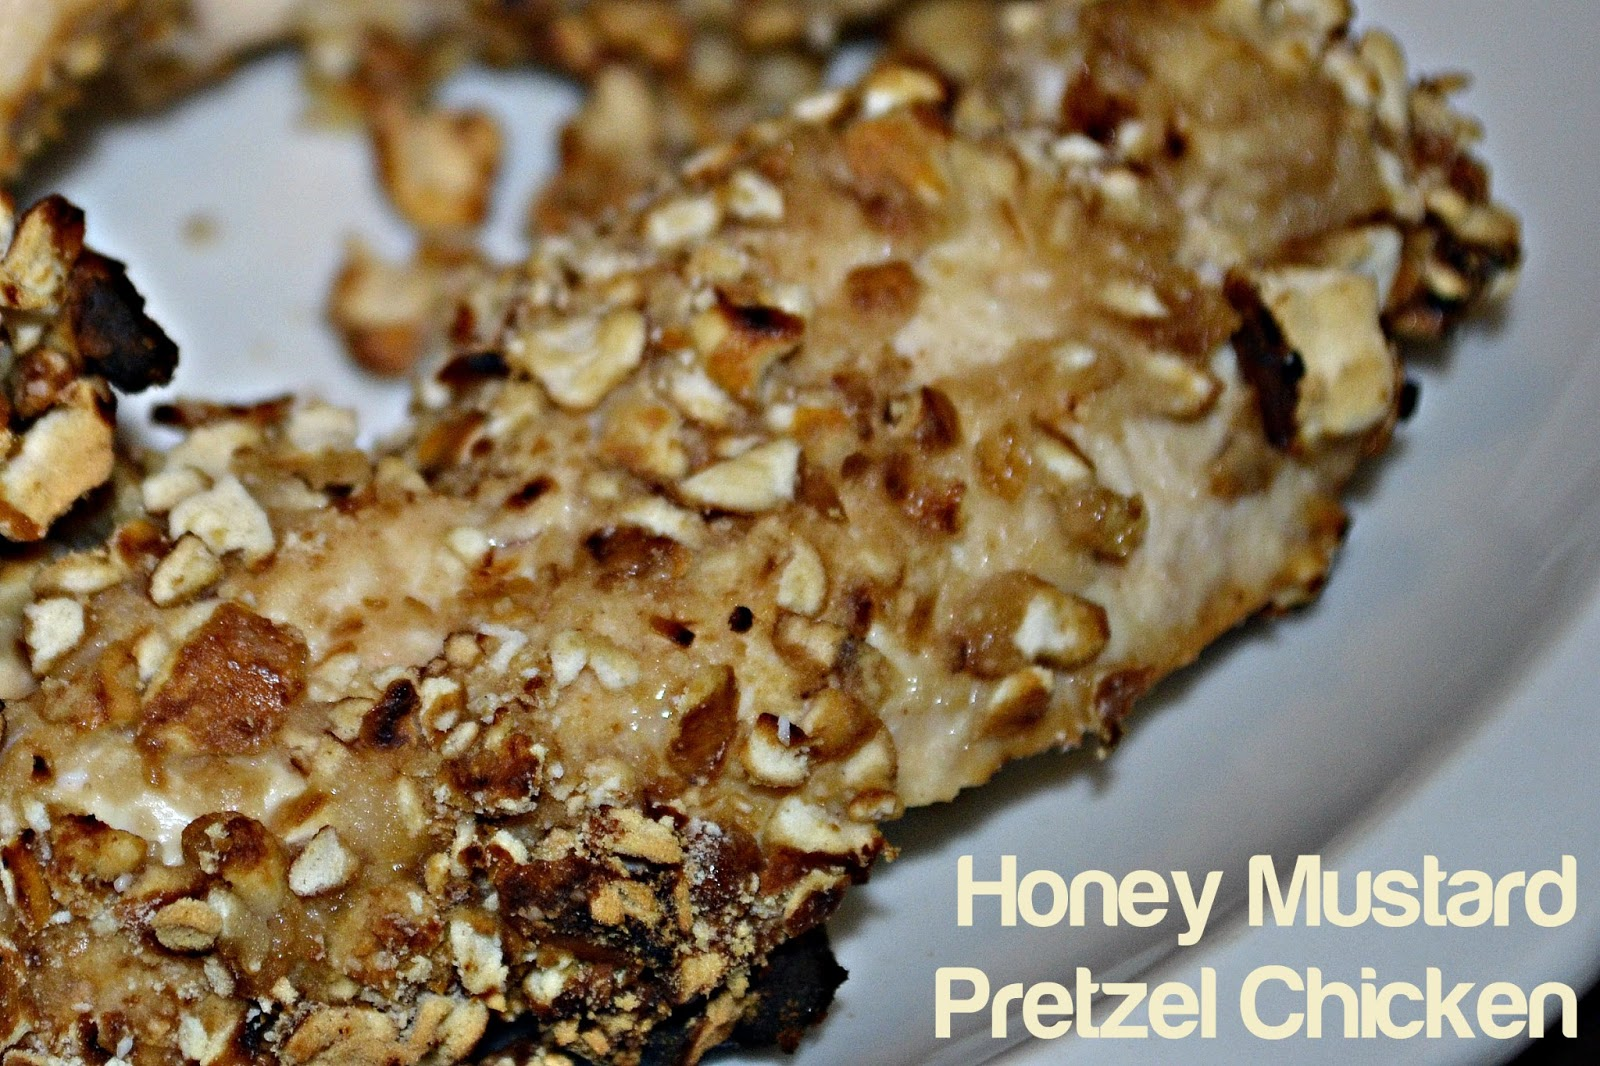 how to make honey mustard pretzels